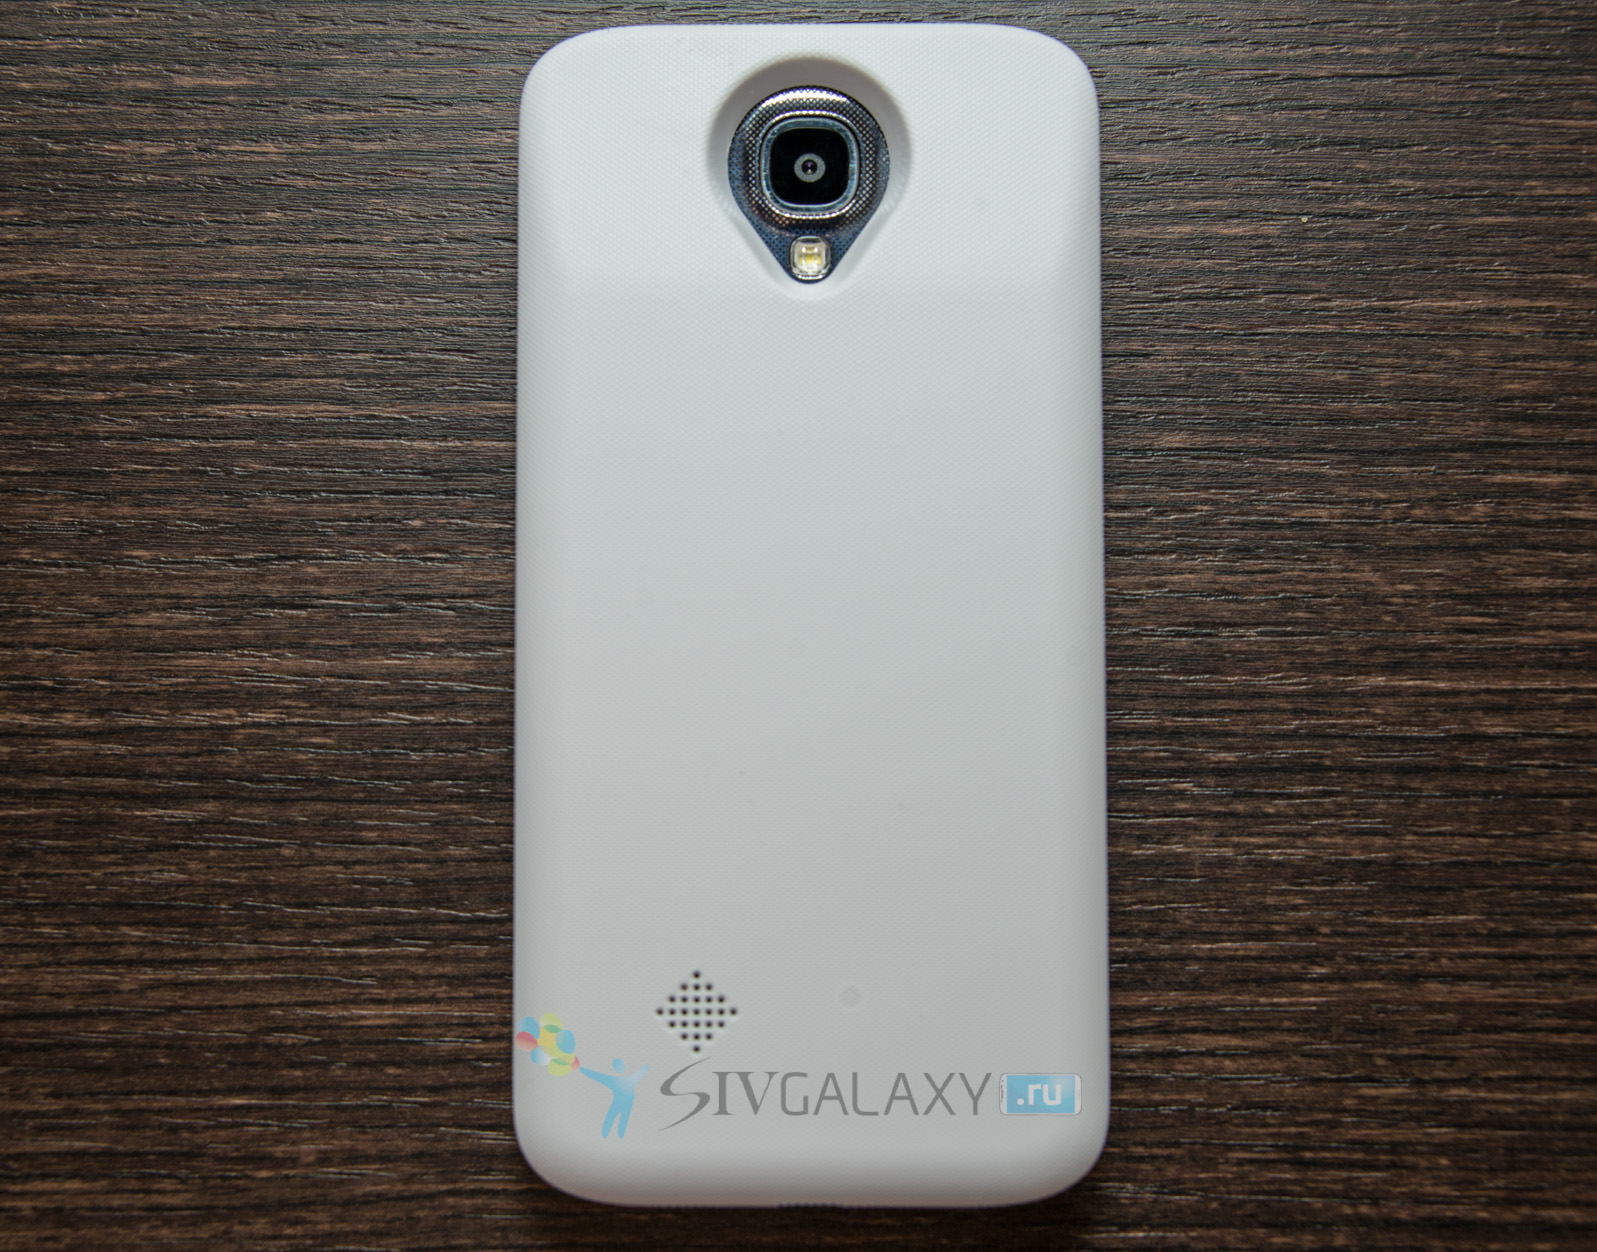 Кейс с аккумулятором для Samsung Galaxy S4 - задняя крышка